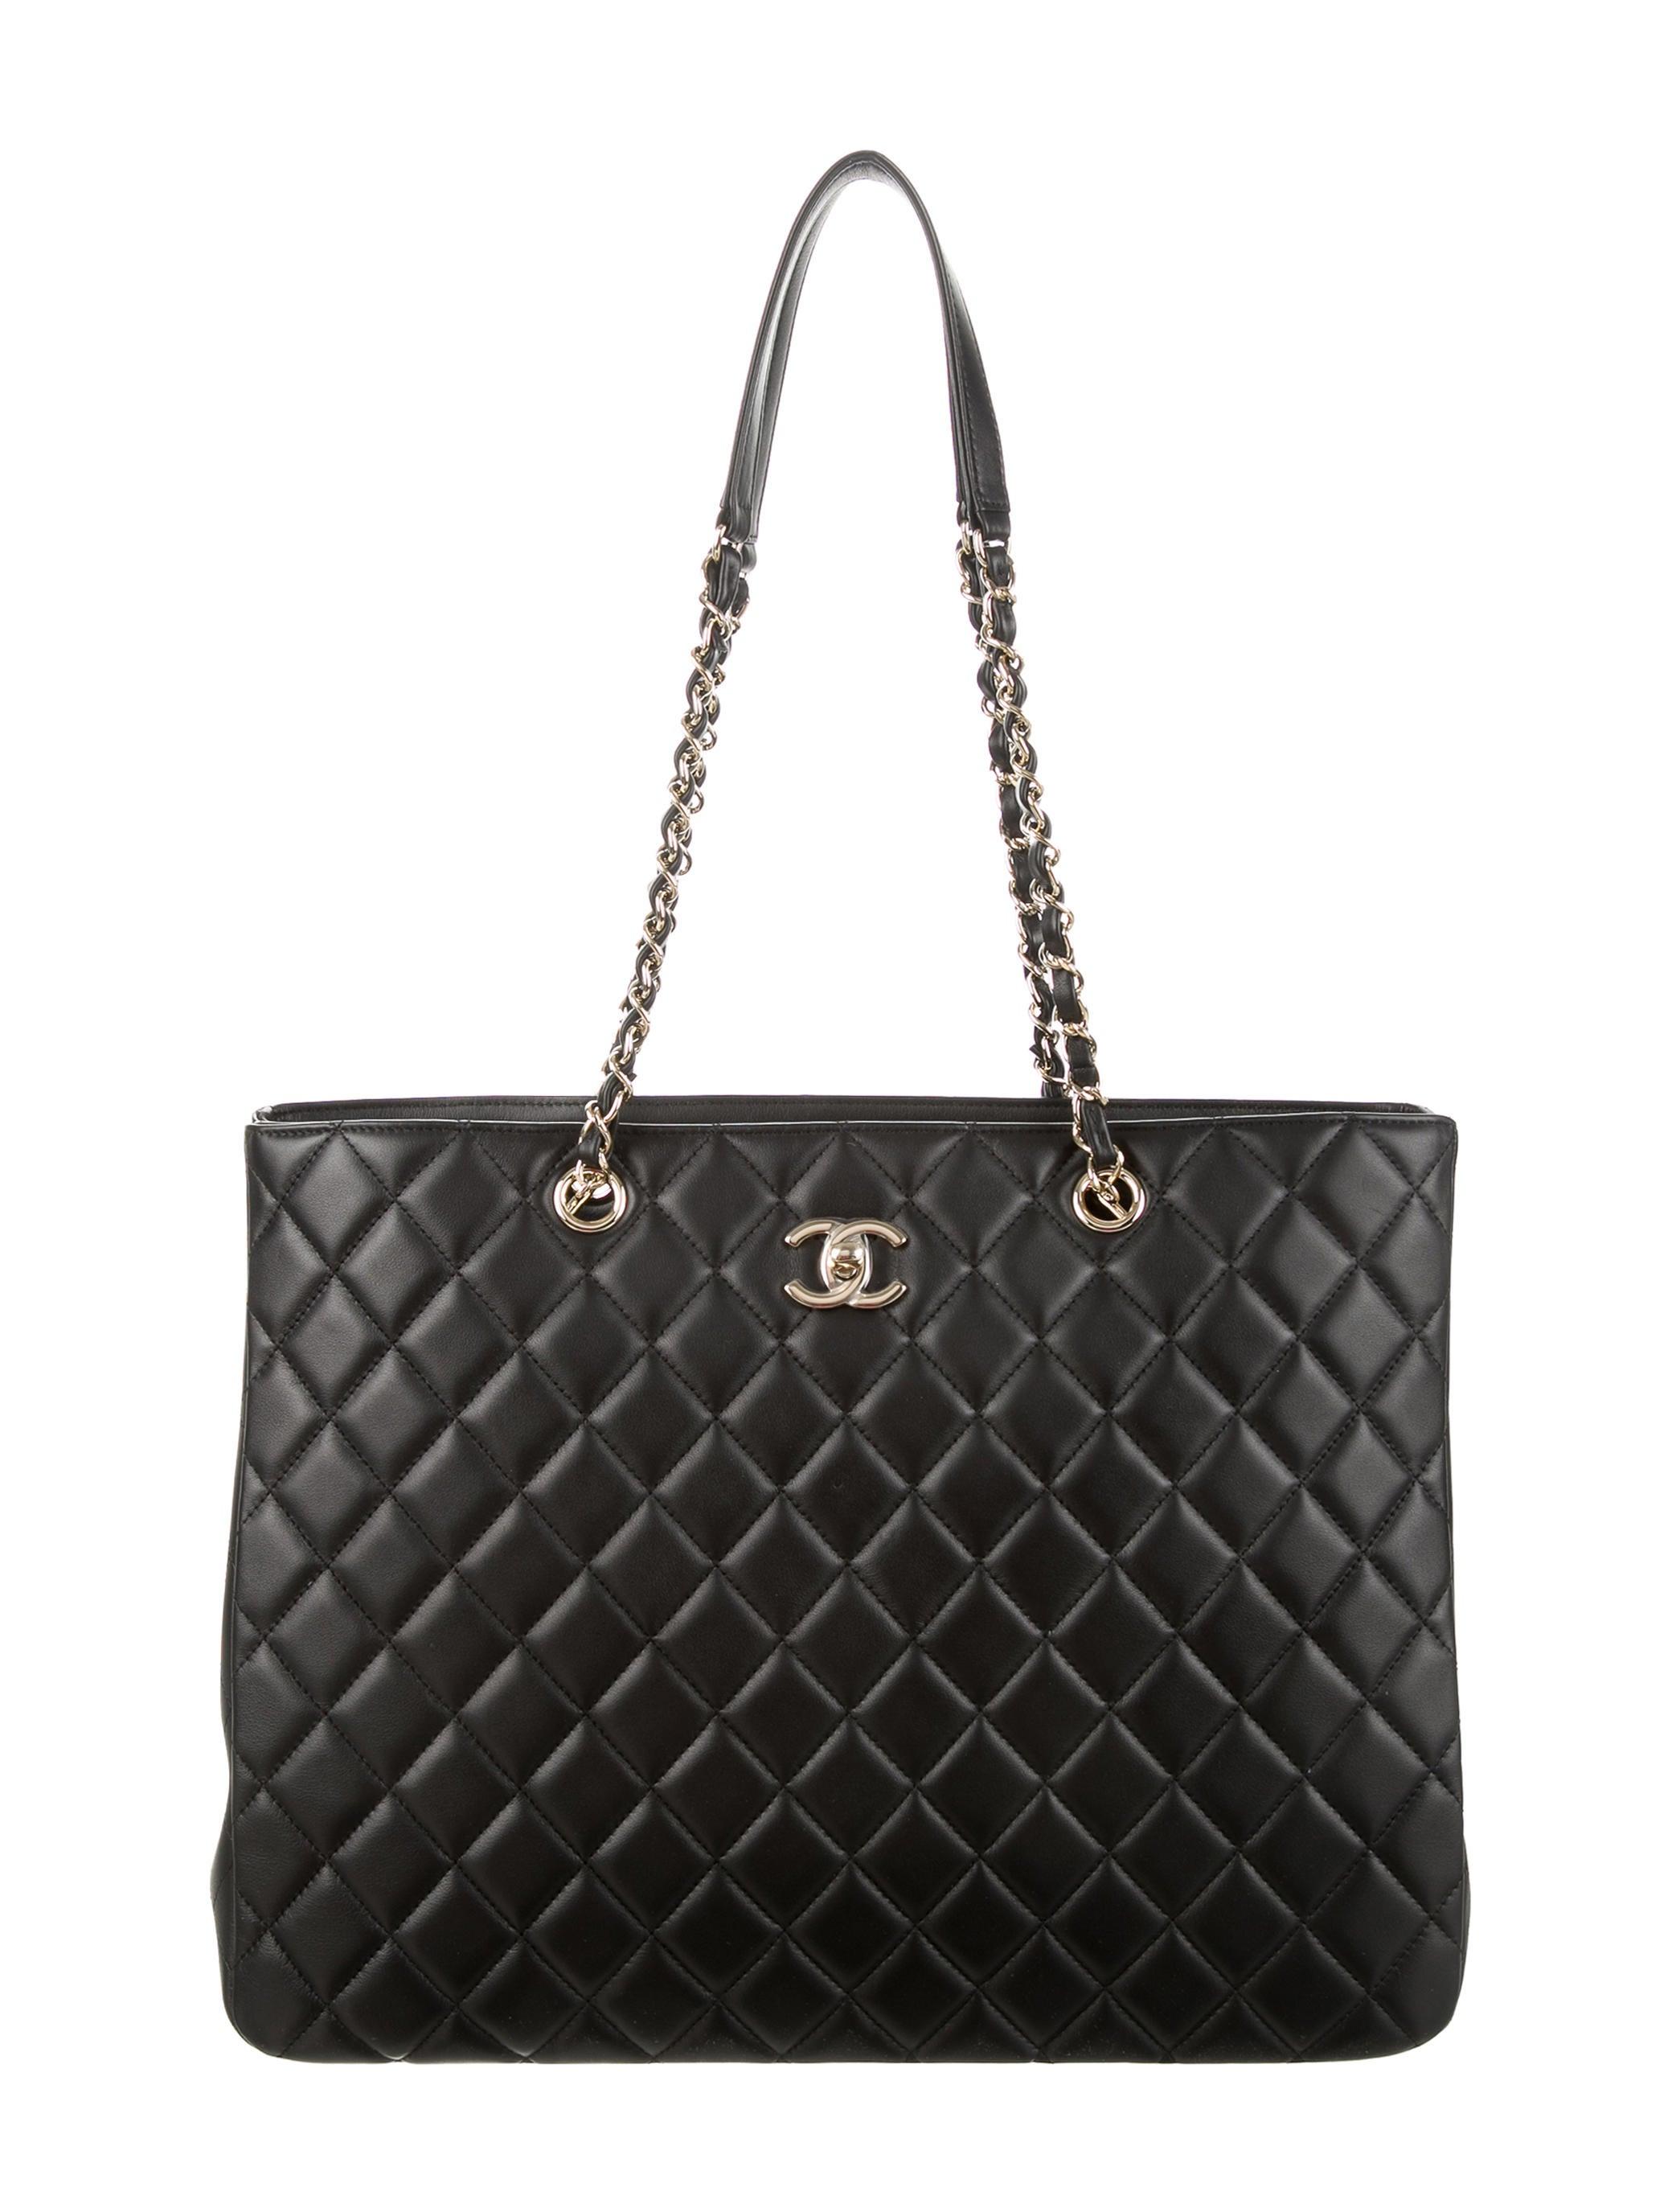 527e51c1e9d Chanel Cruise 2016 Timeless Classic Tote w  Tags - Handbags ...